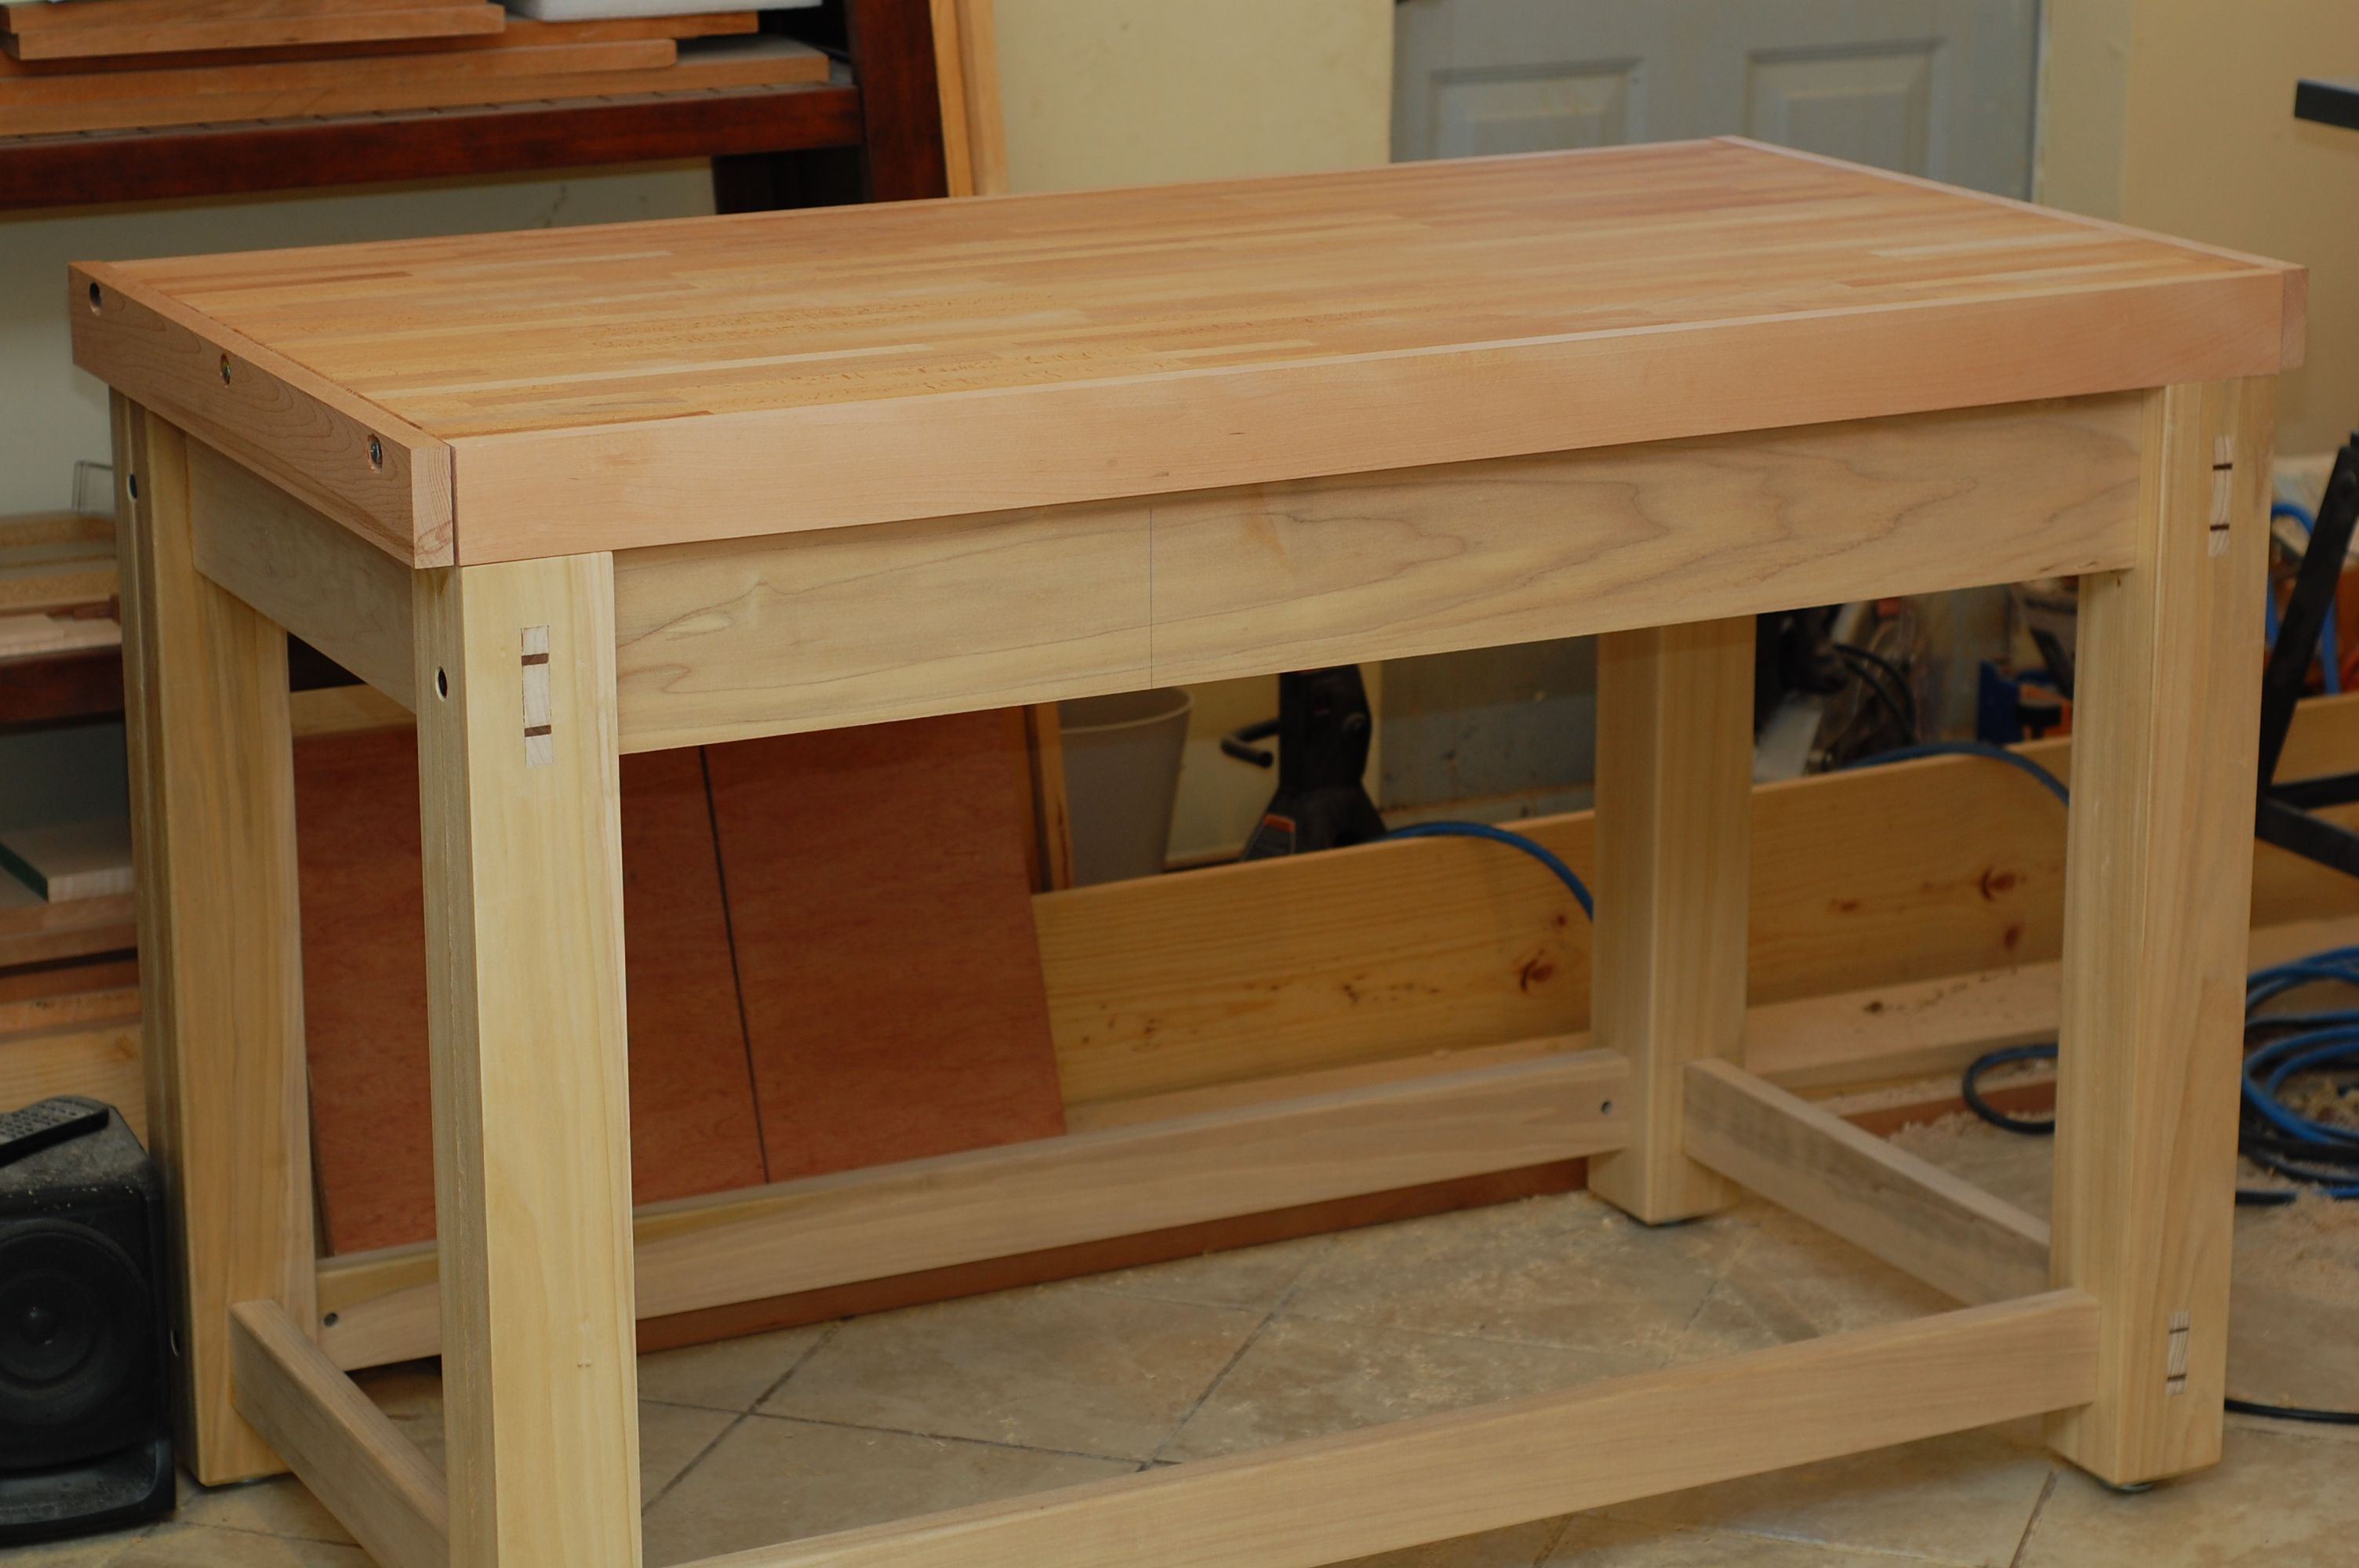 Miraculous Wooden Wooden Work Bench Plans Pdf Plans Woodworking Short Links Chair Design For Home Short Linksinfo